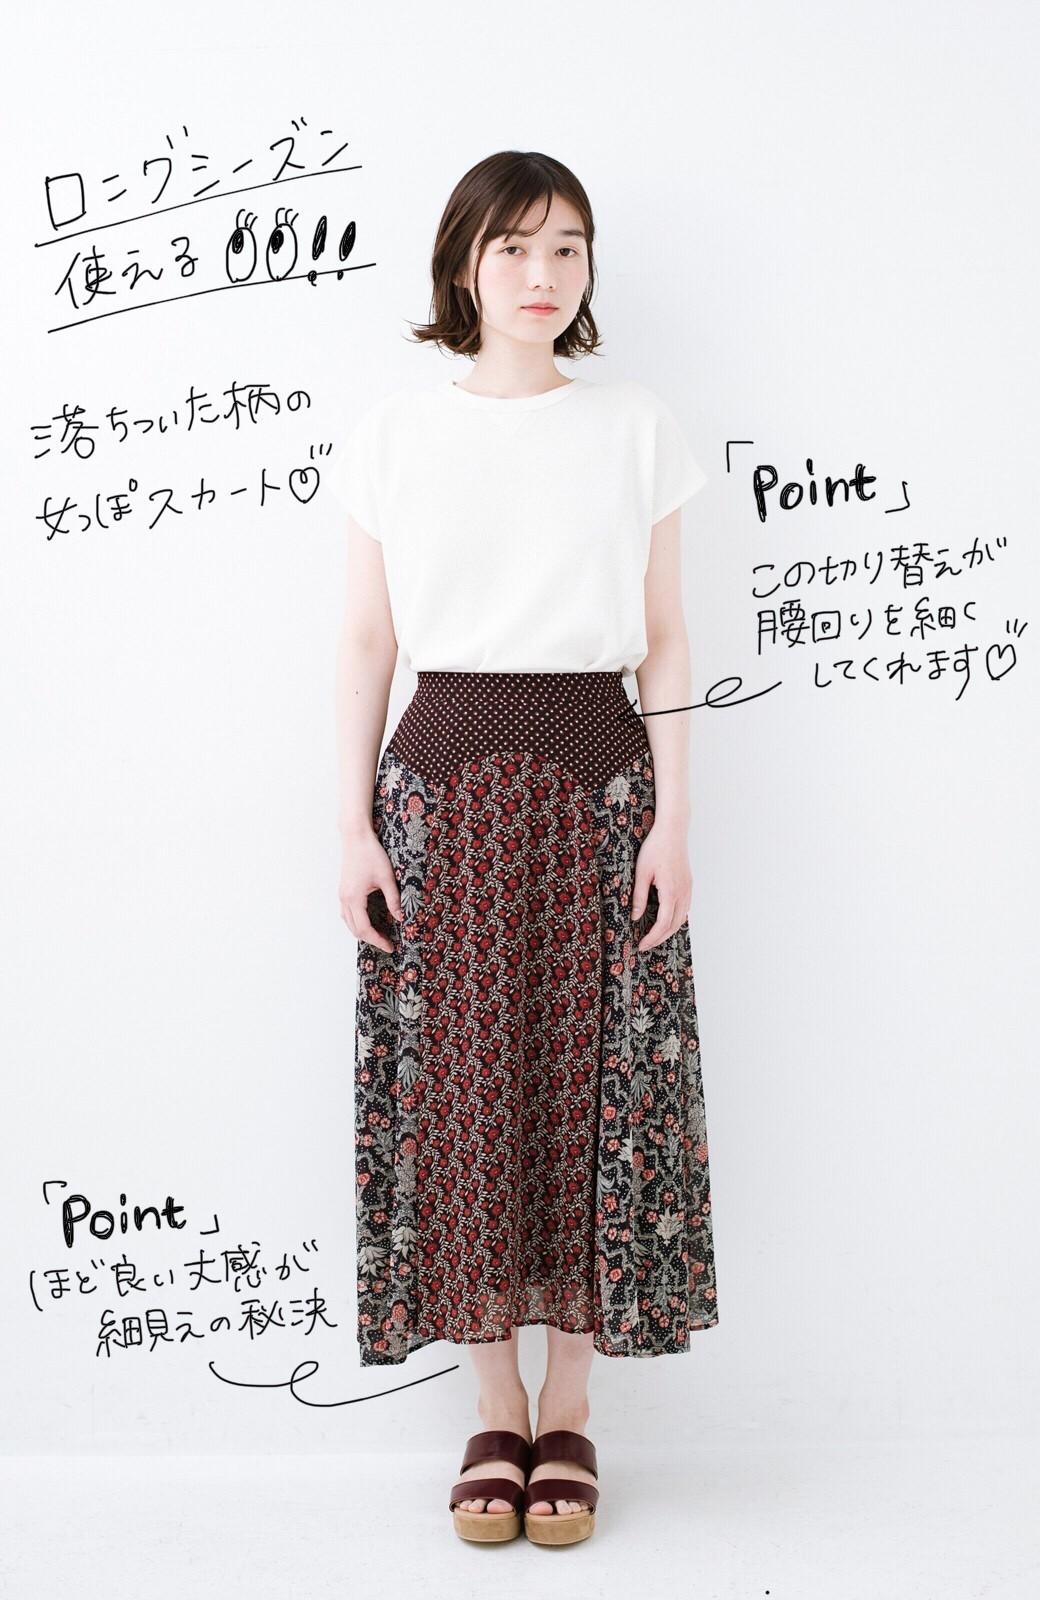 haco! 【洗濯機洗いOK】シンプルなトップスに合わせるだけでかわいくなれる MIX柄スカート <ブラック系その他>の商品写真2